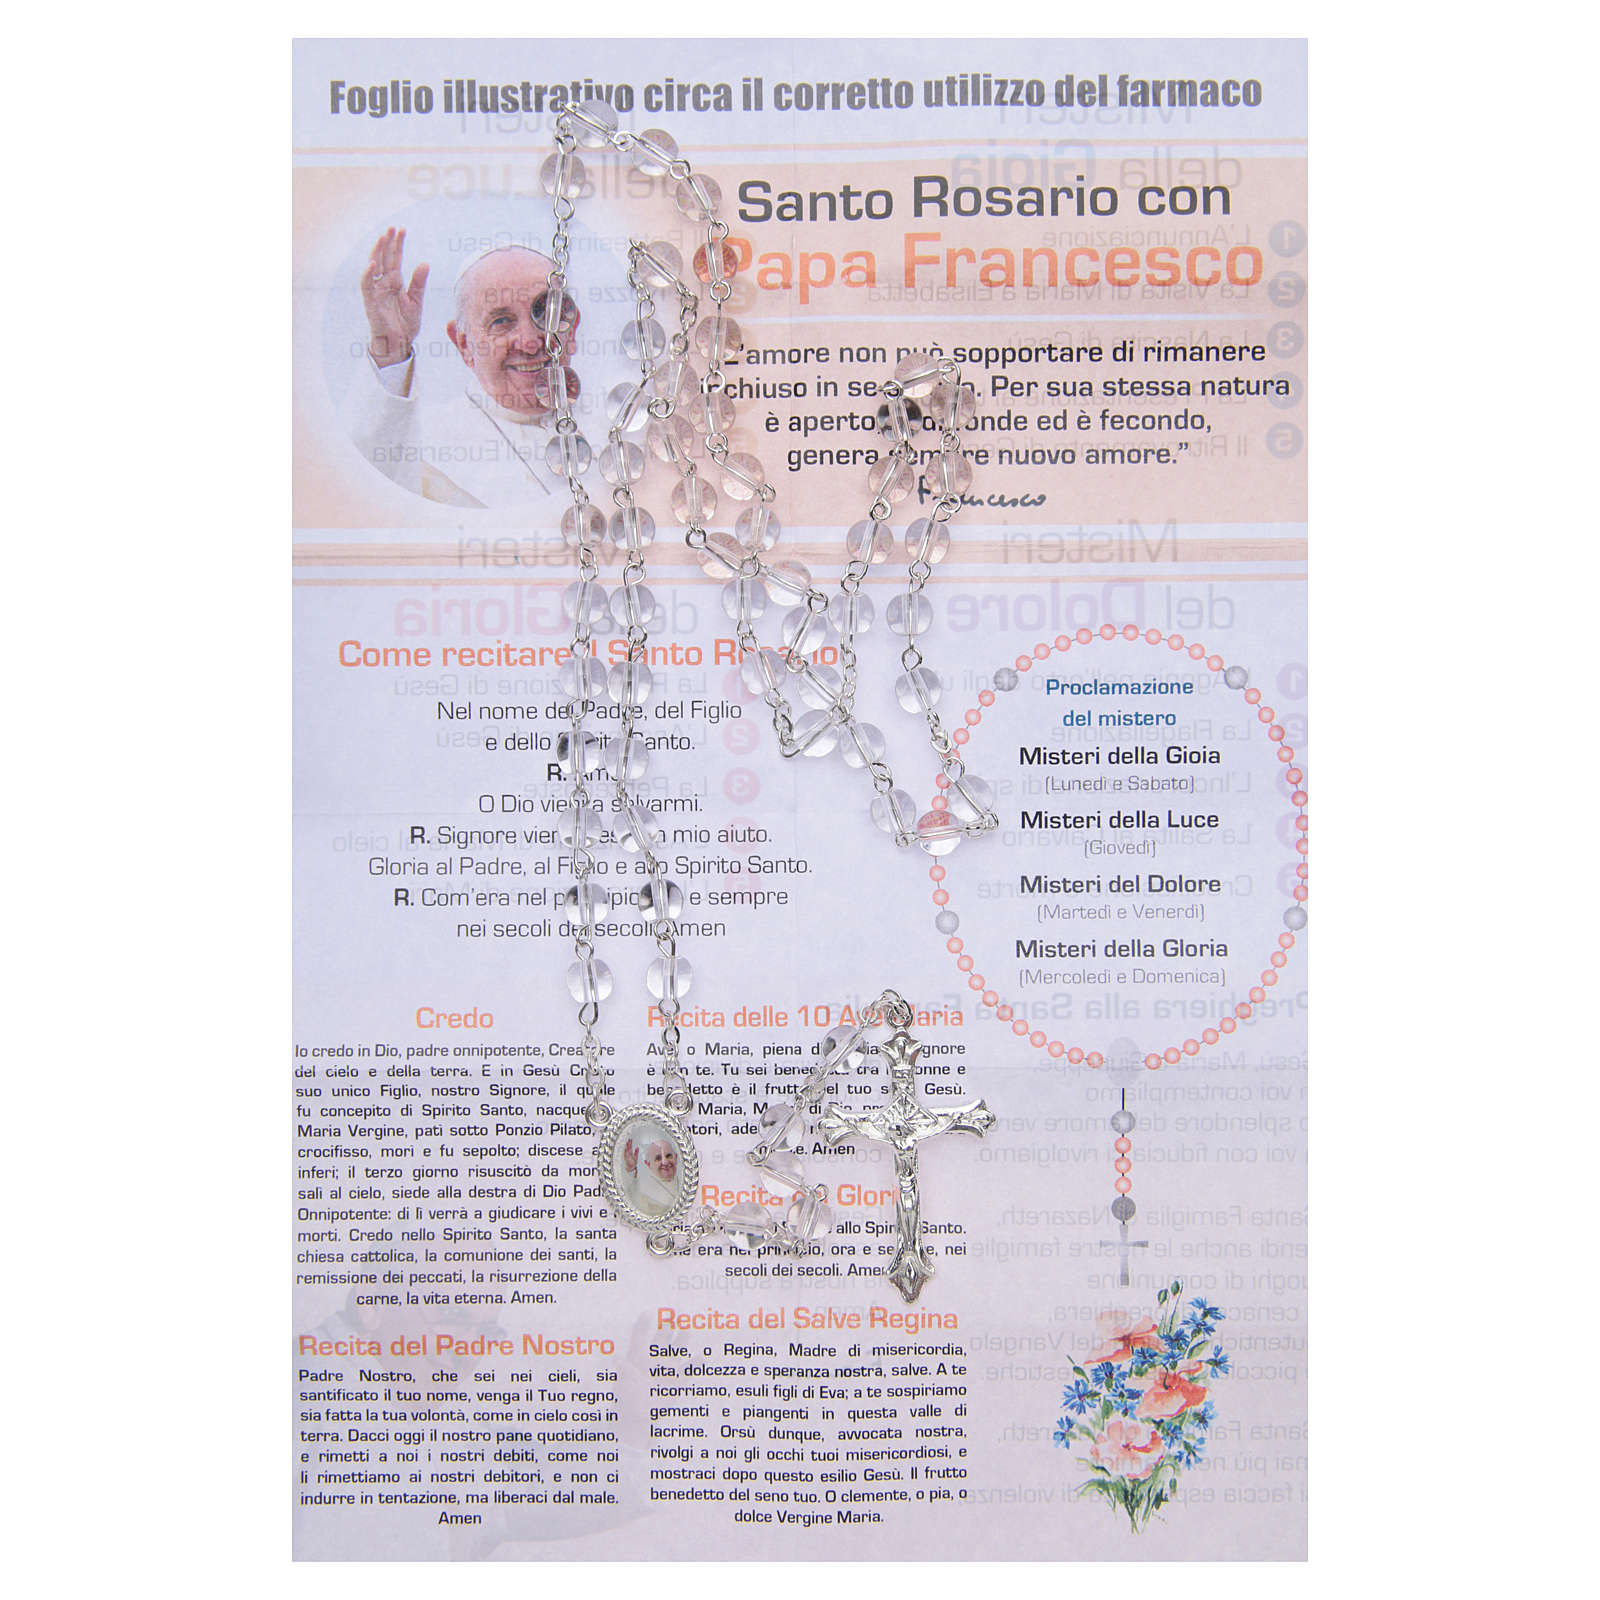 Rosario Infermeria dell'Anima Papa Francesco ITALIANO 4